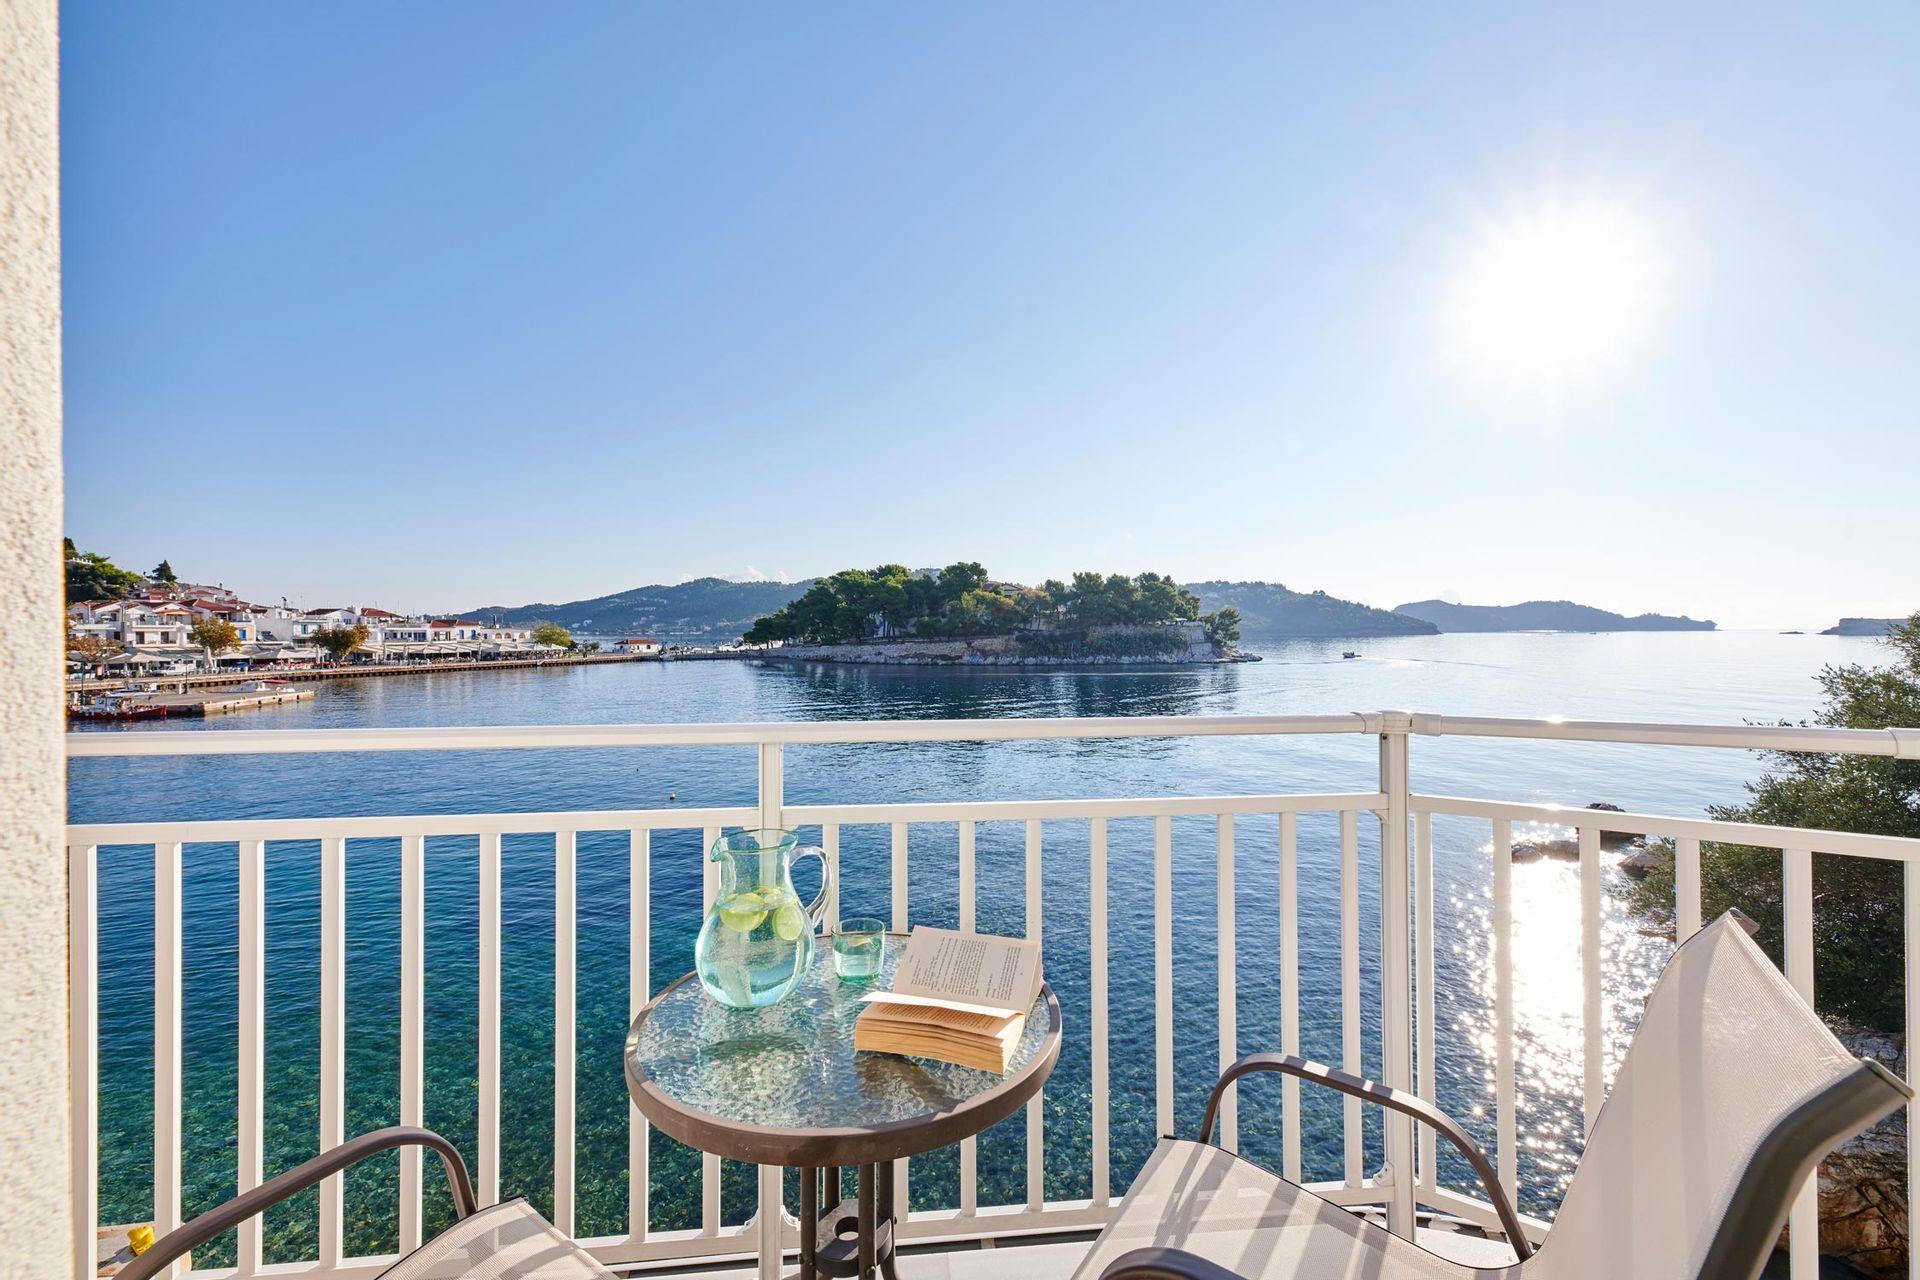 The Water Hotel Skiathos